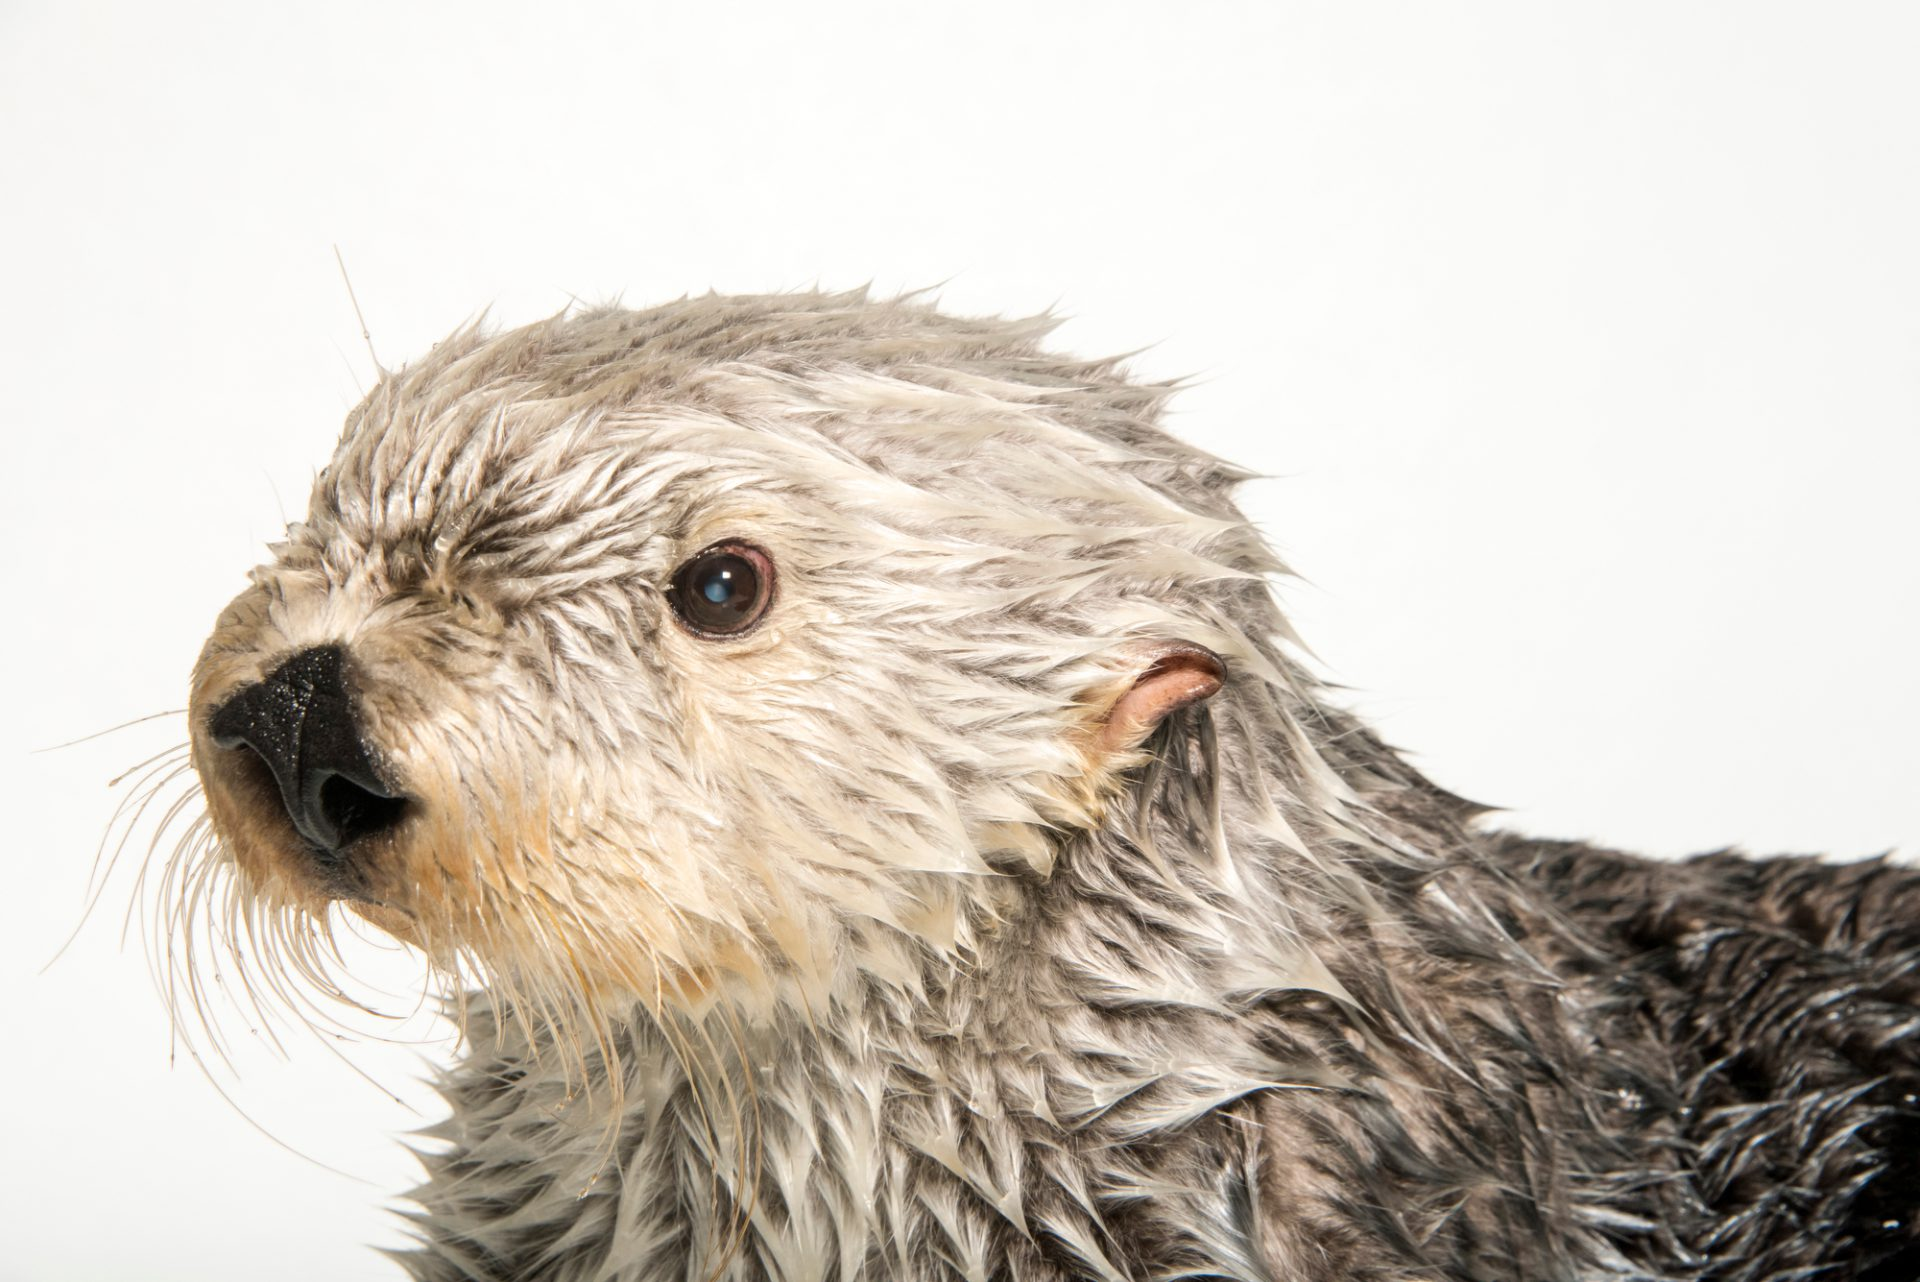 Photo: A southern sea otter (Enhydra lutris nereis) named Brook, age 19.